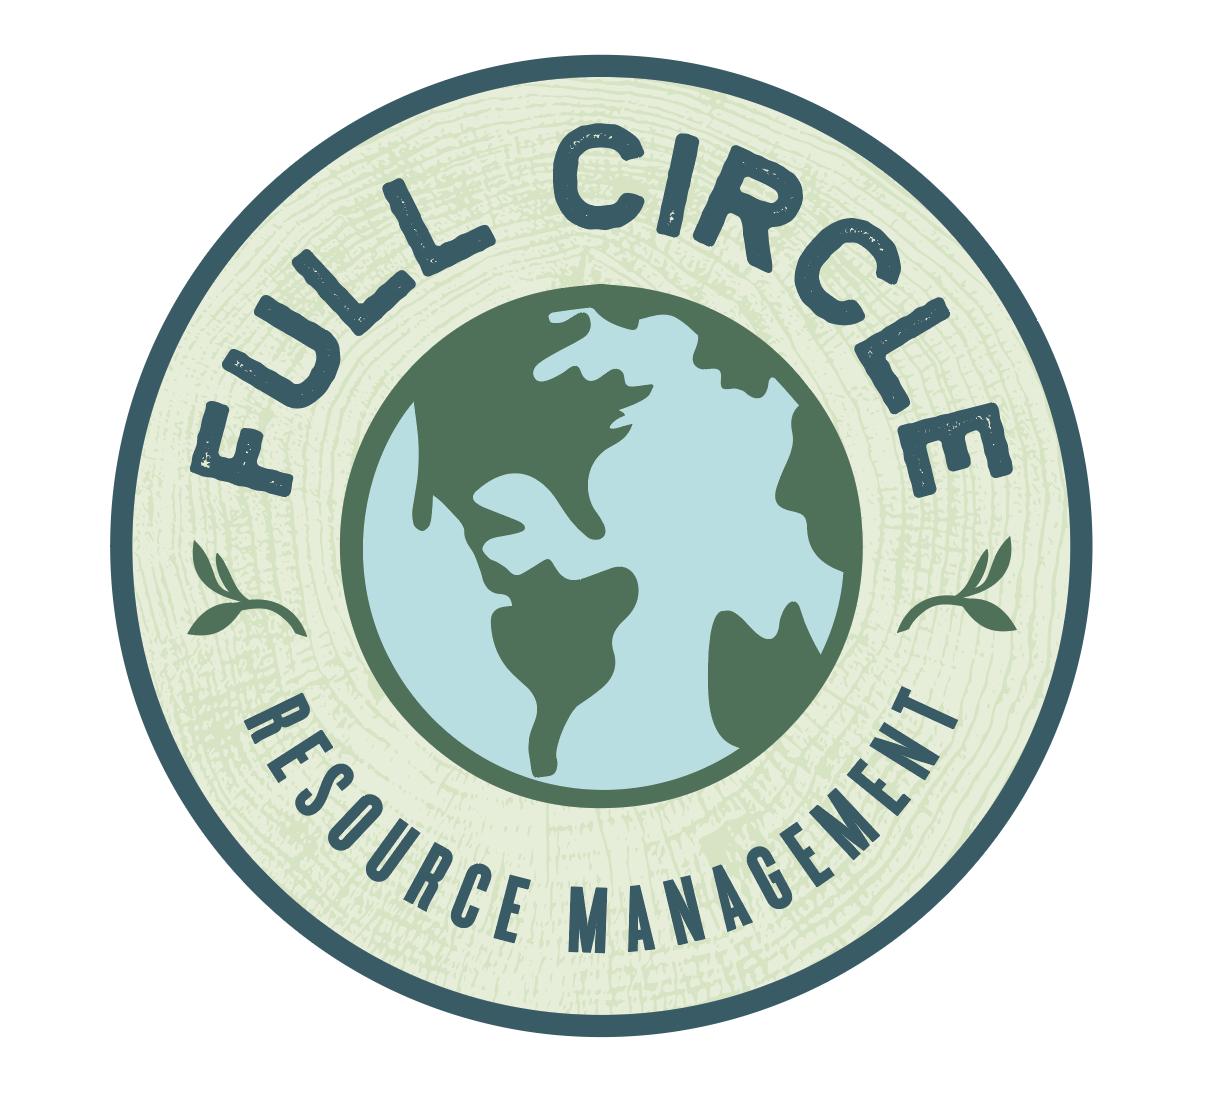 Full Circle Resource Management